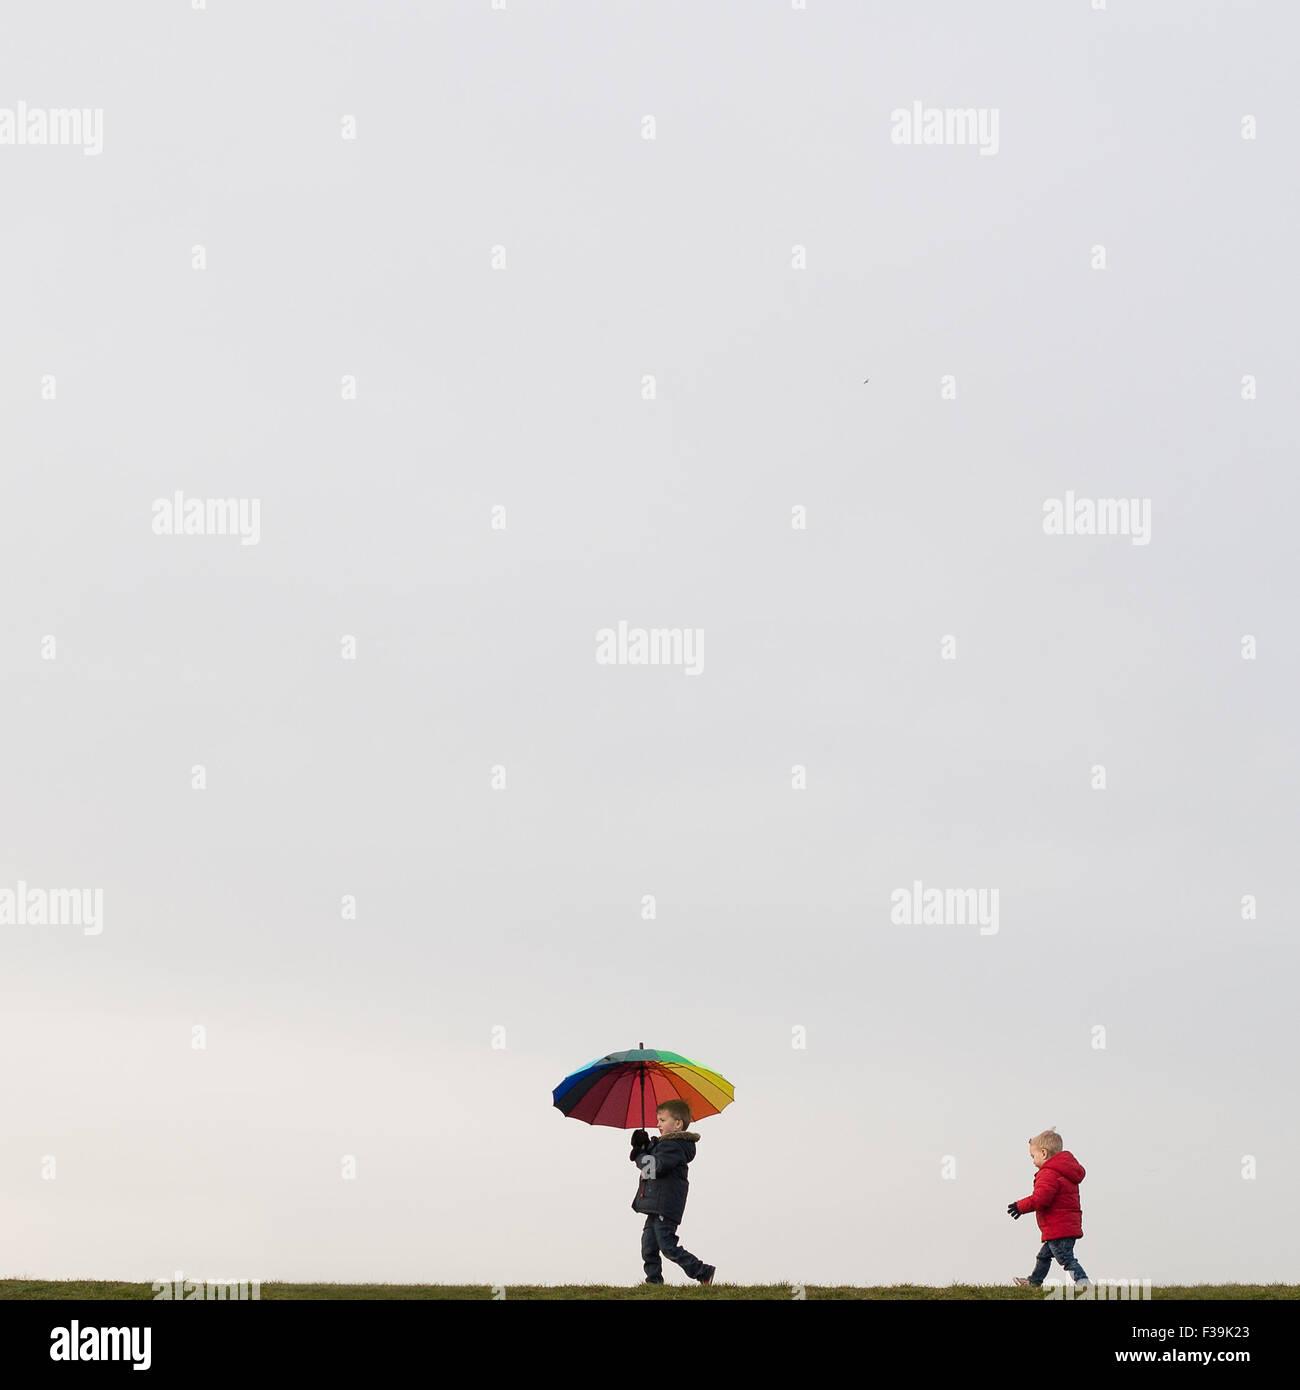 Boys walking, holding an umbrella - Stock Image